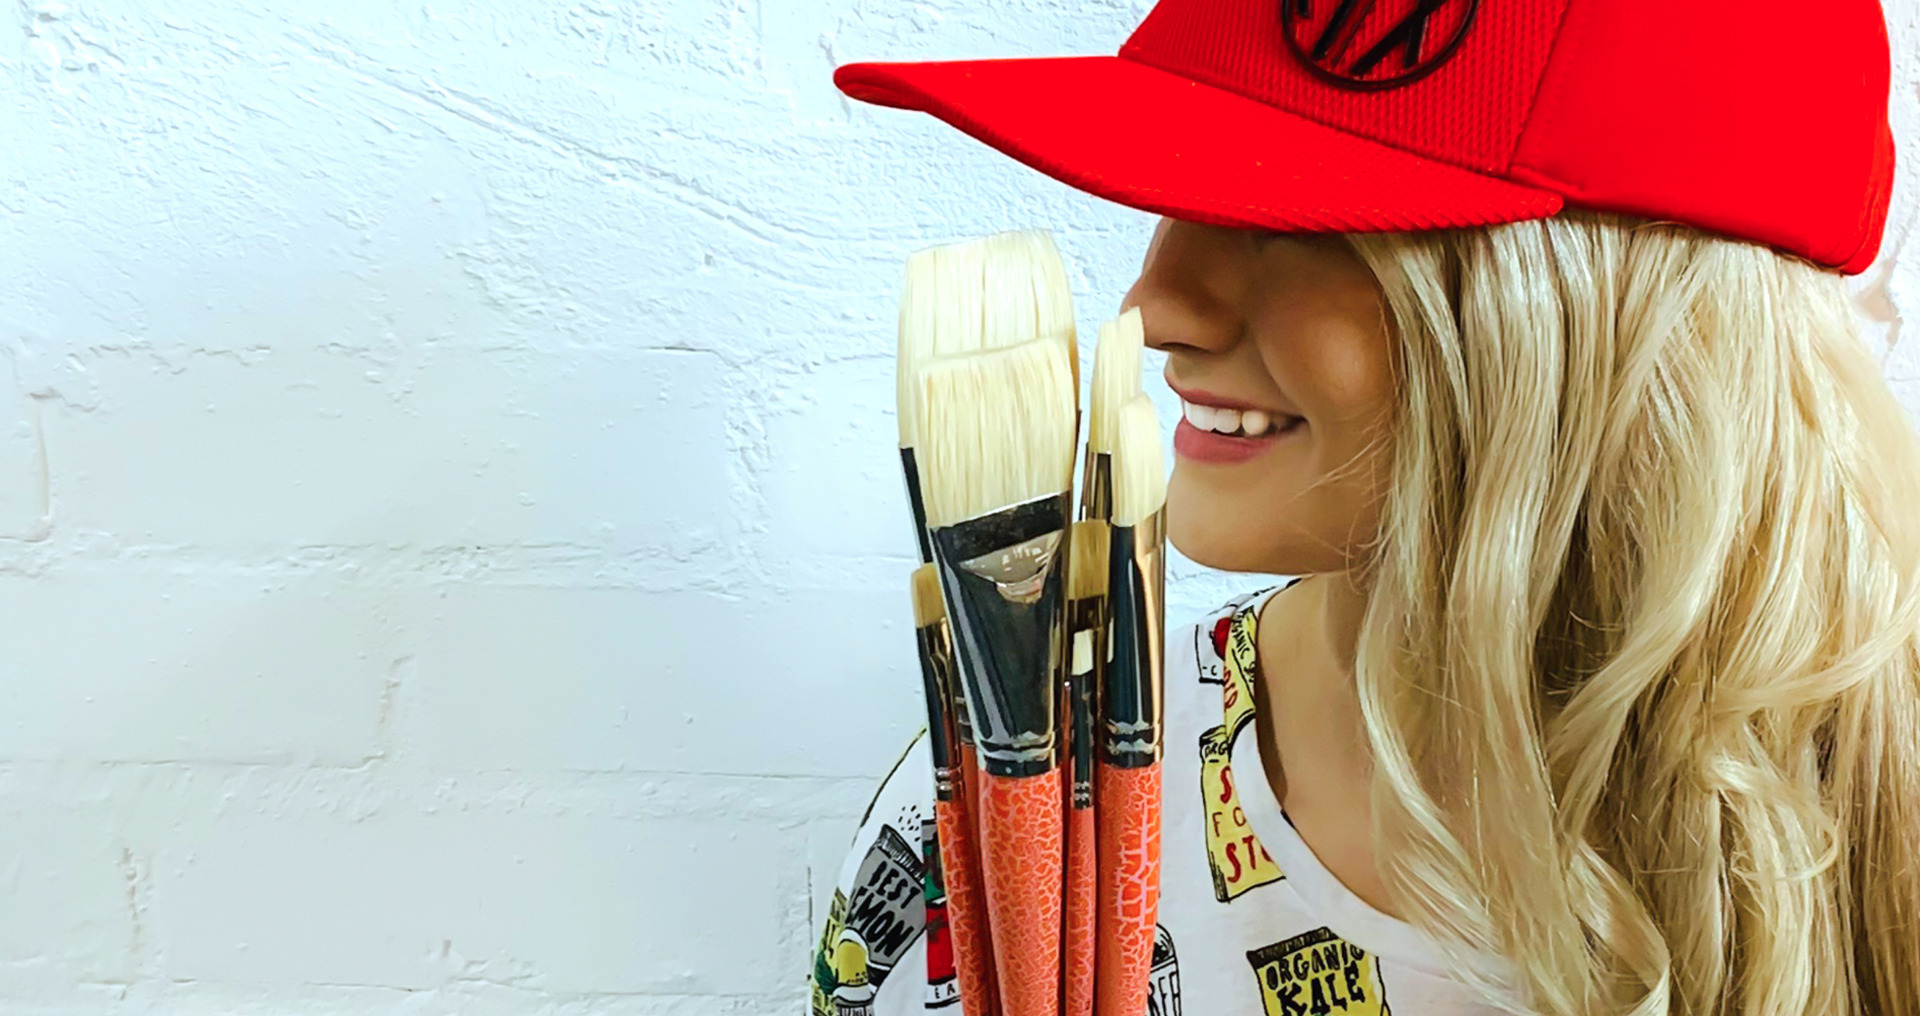 Interlocked Hog Hair Paintbrushes by Pro Hart Swagger